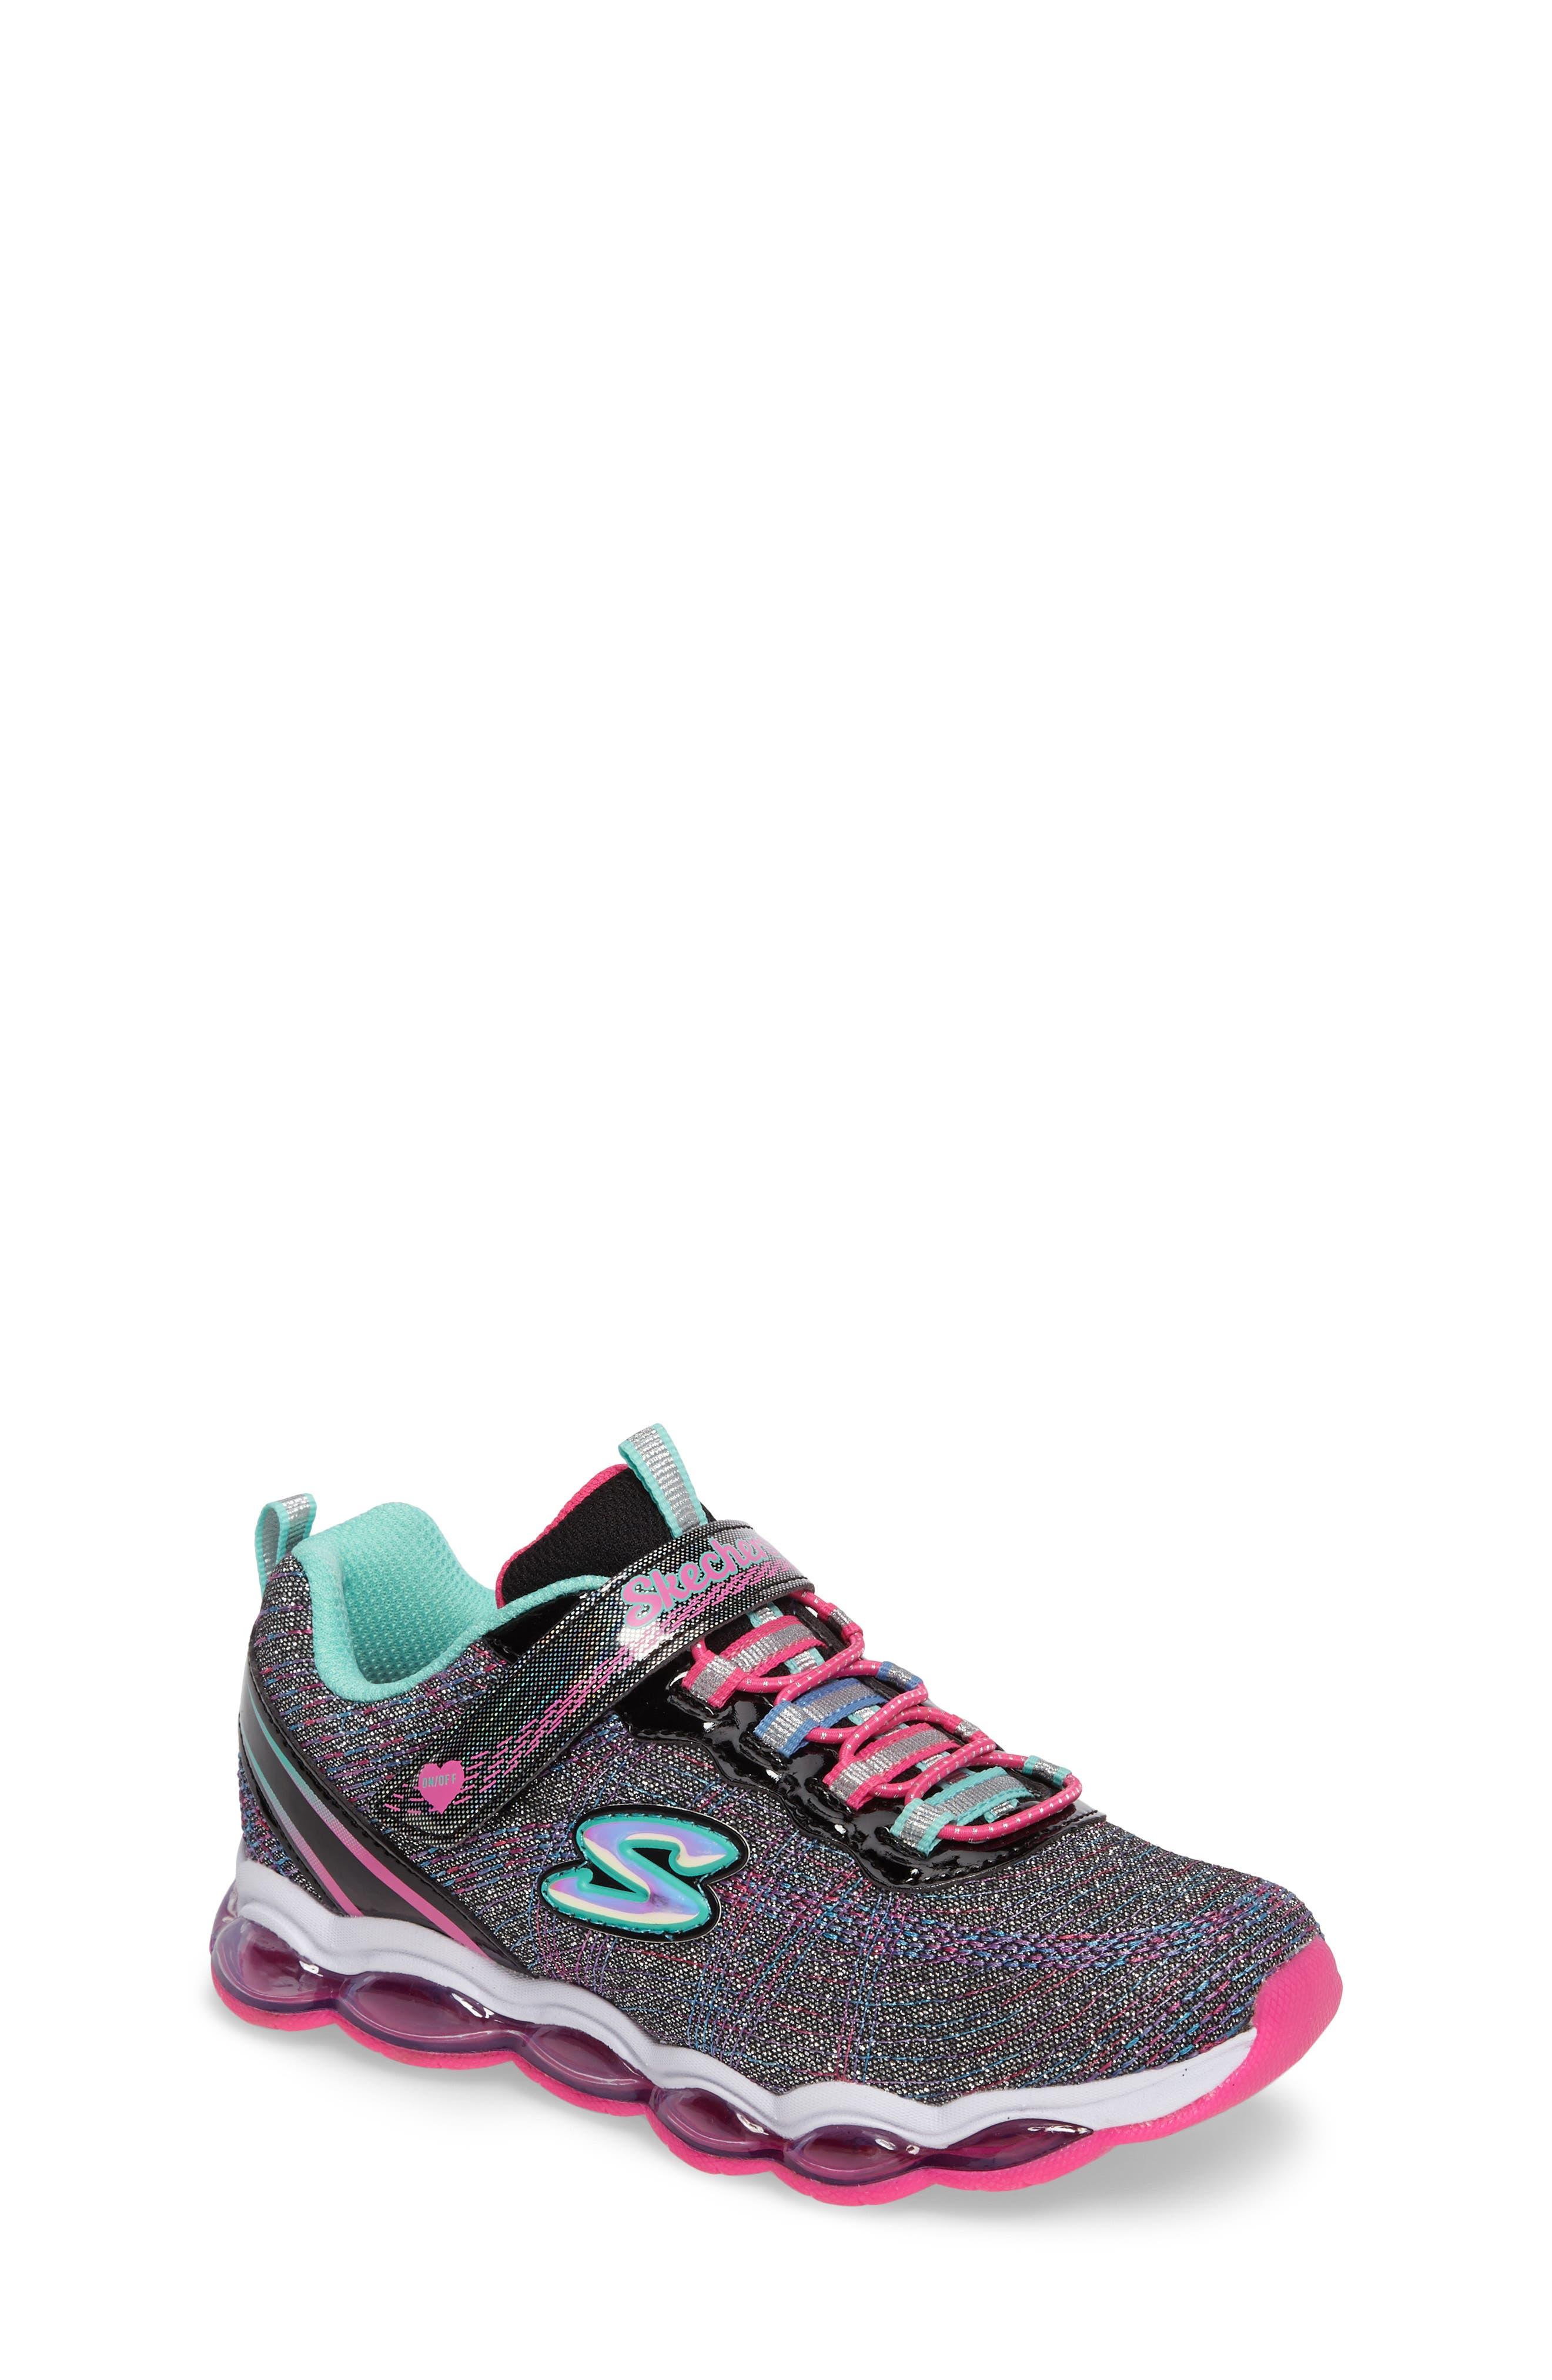 SKECHERS Glimmer Lights Sneakers (Toddler & Little Kid)